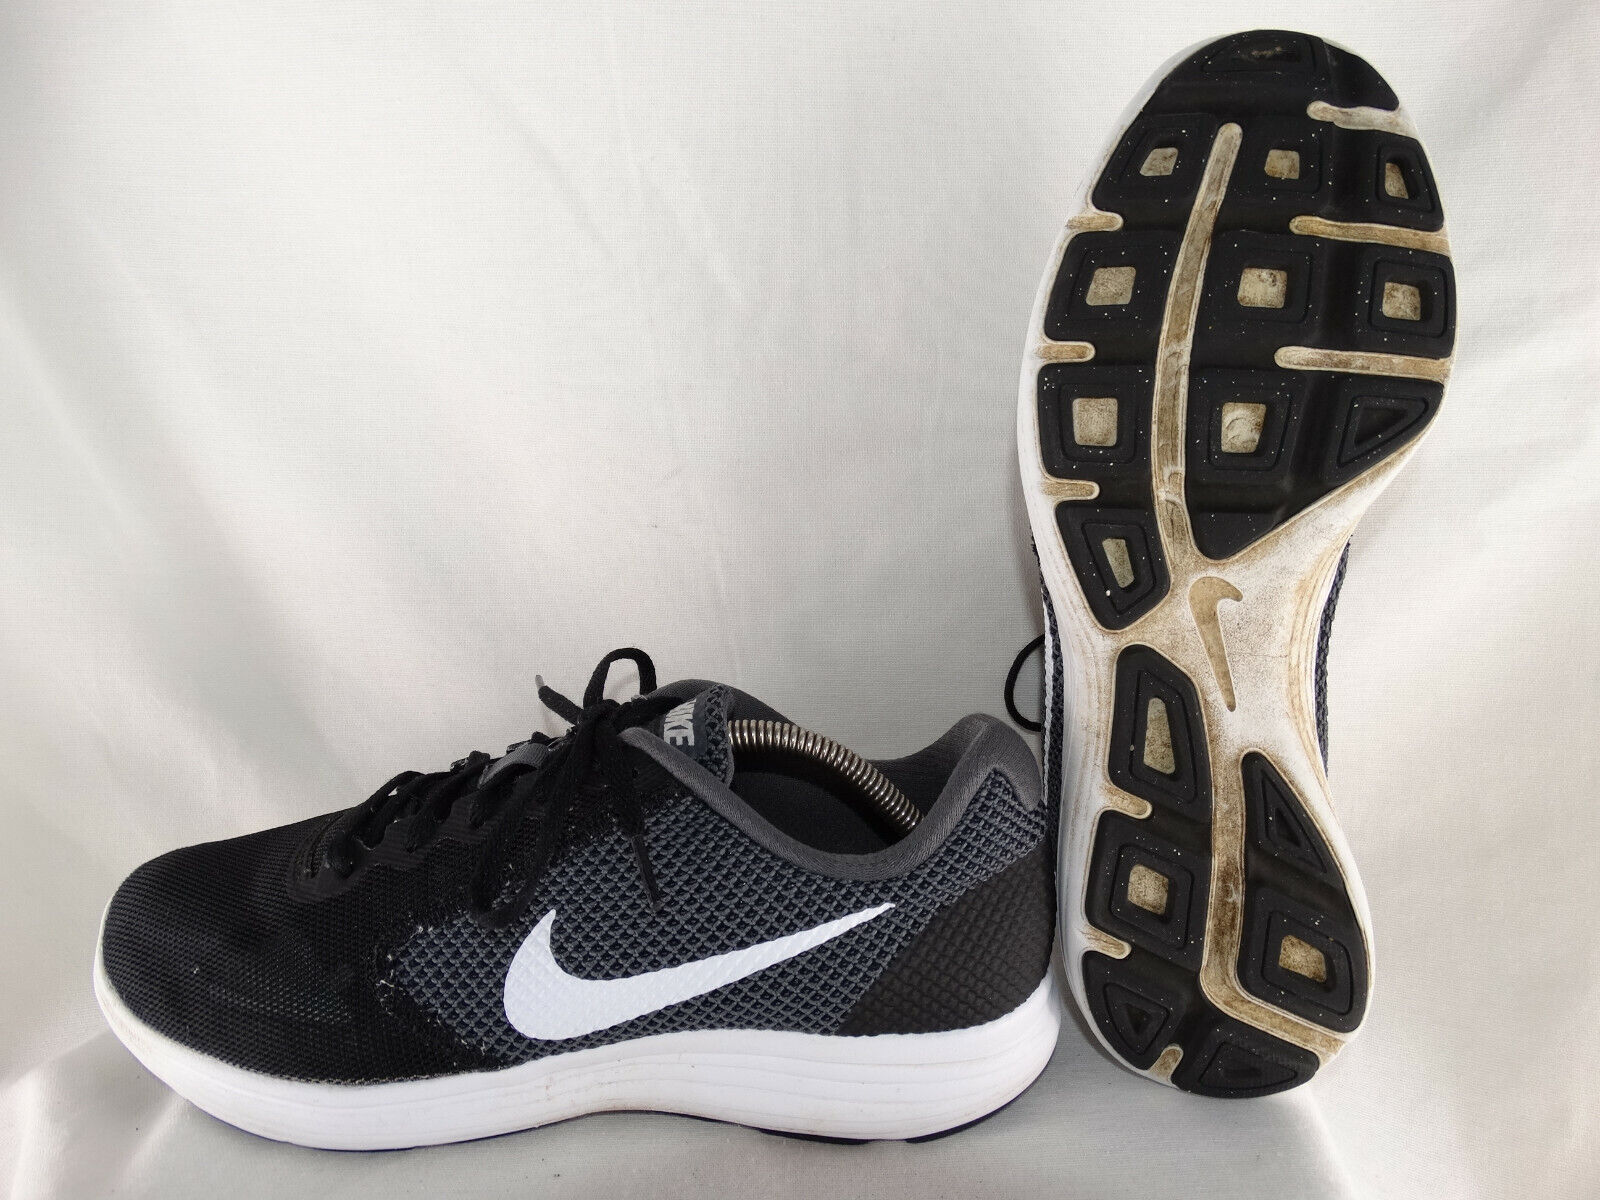 Nike Revolution 3 Laufschuhe 819300-001 schwarz-weiß EU 43 US 9,5